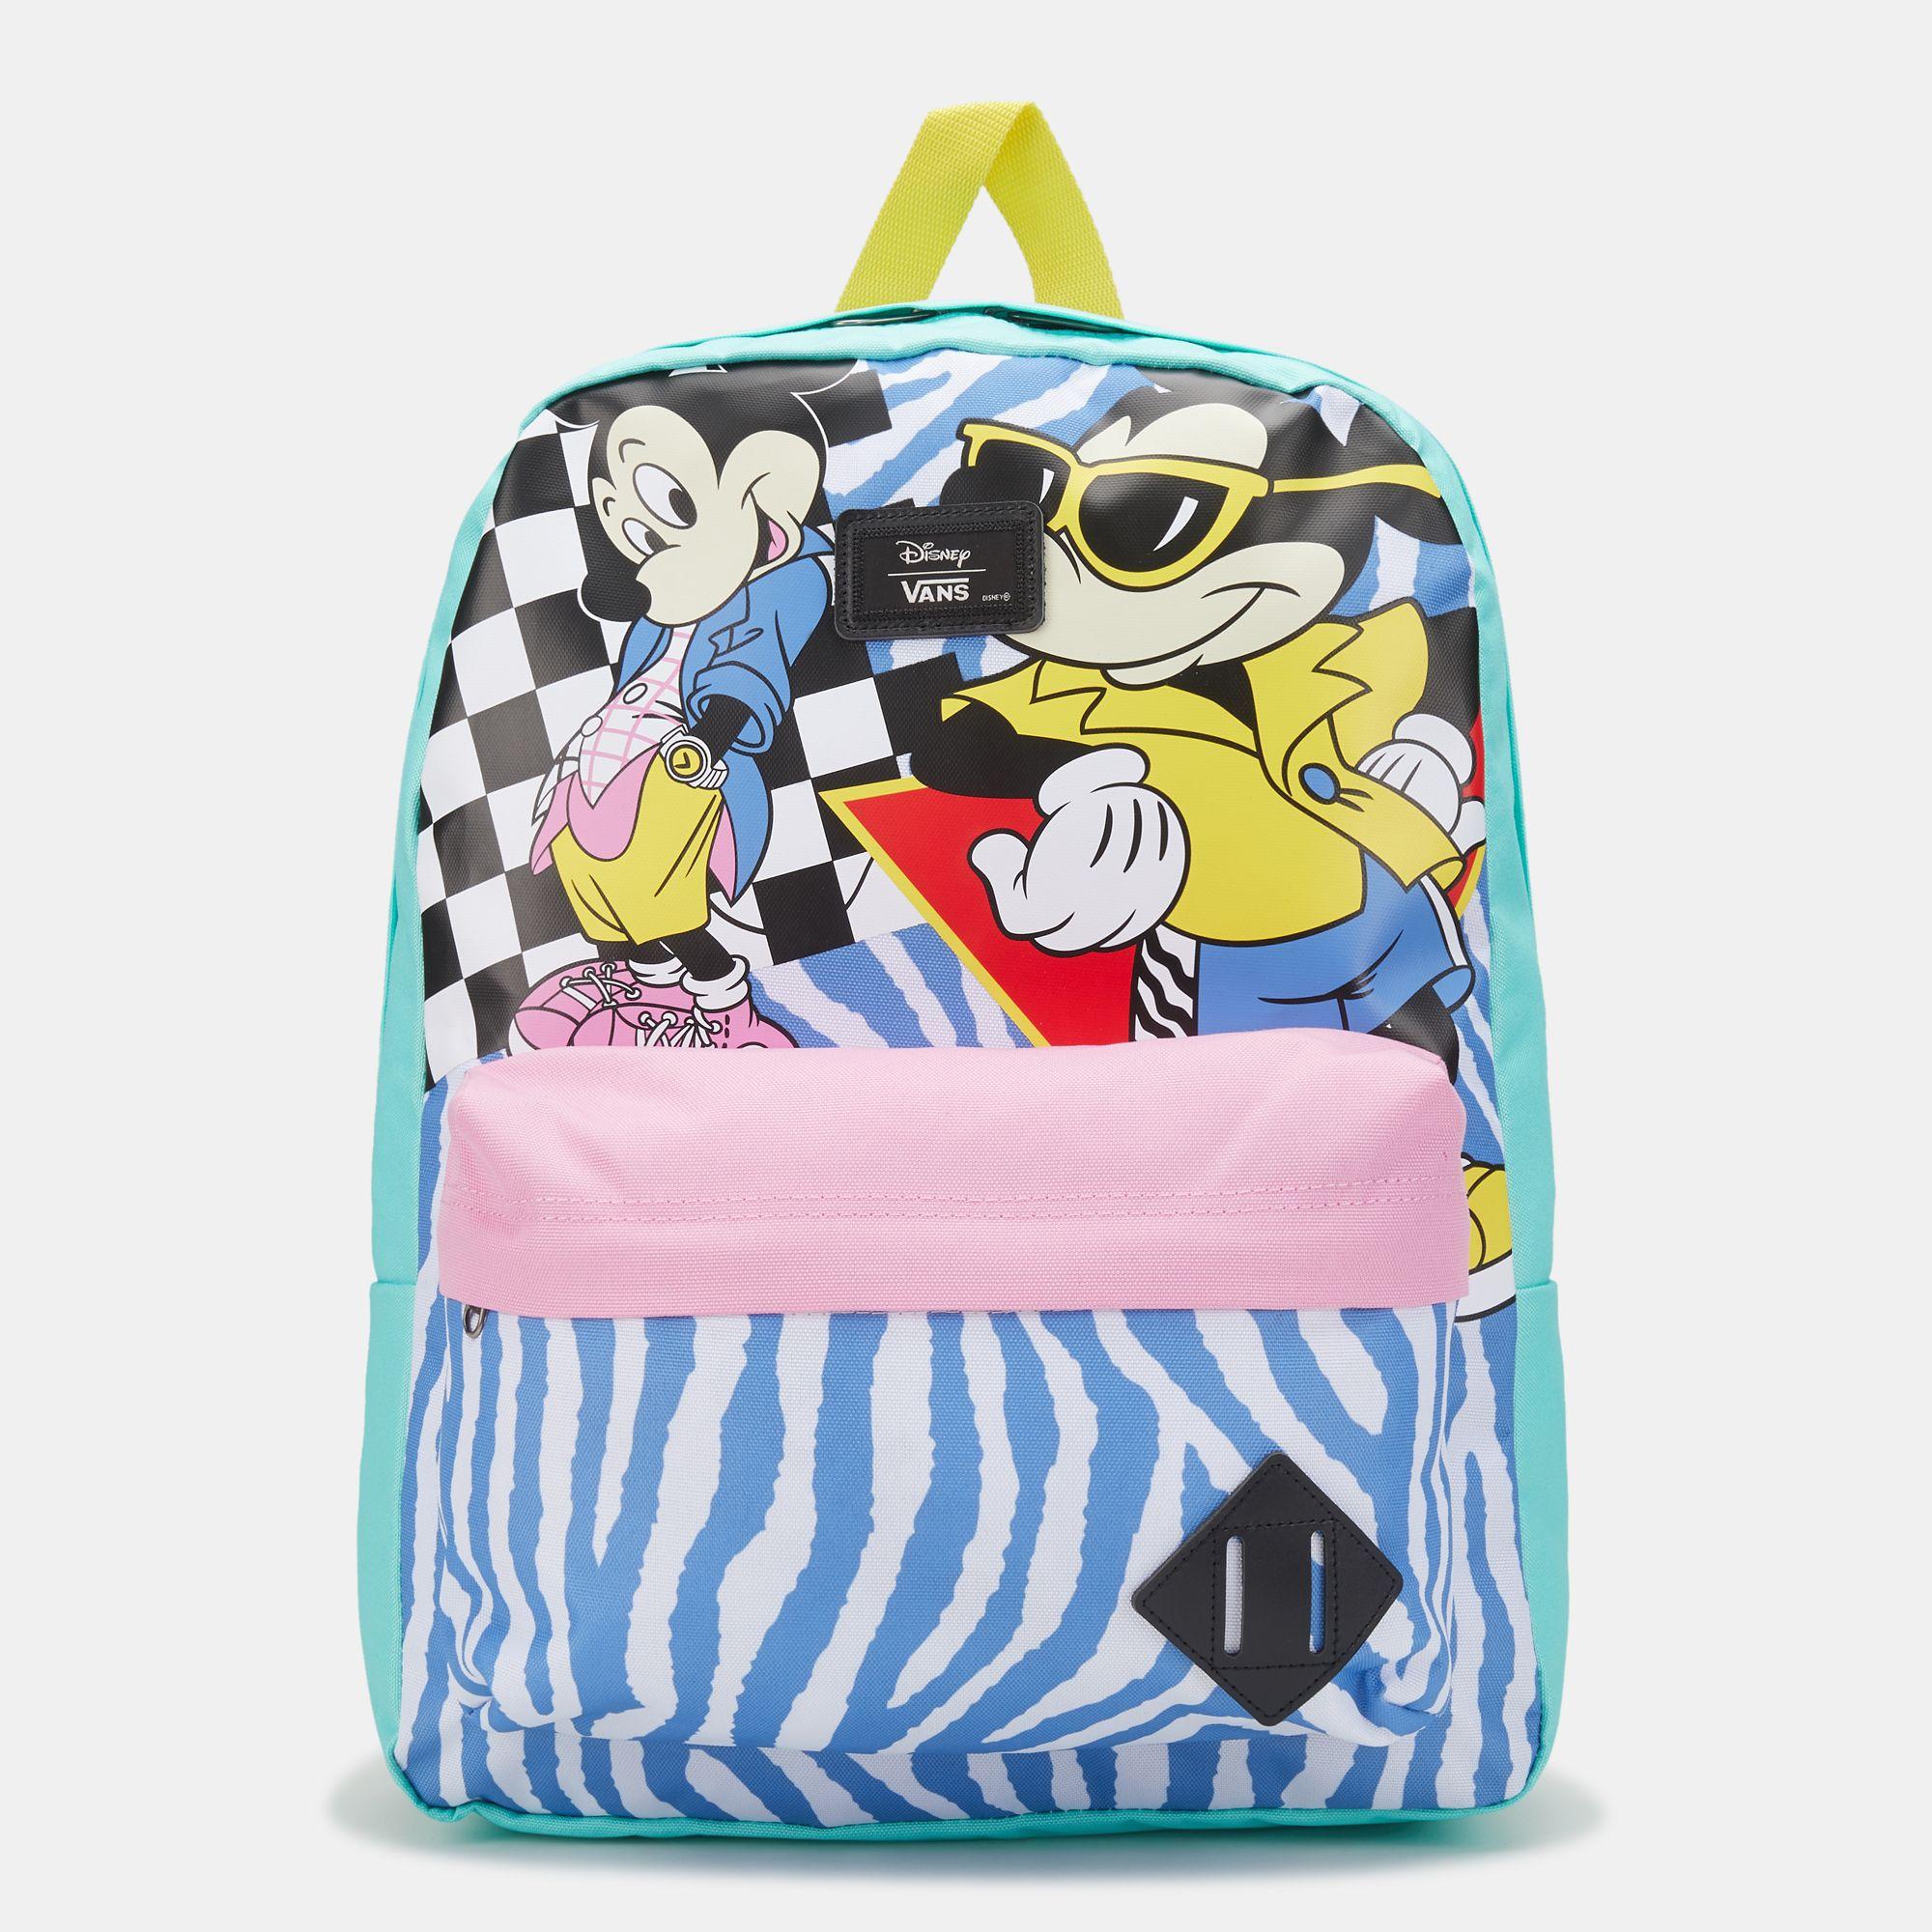 cbdc7d19f02 Vans X Disney Mickey Mouse Old Skool Backpack | Backpacks And ...